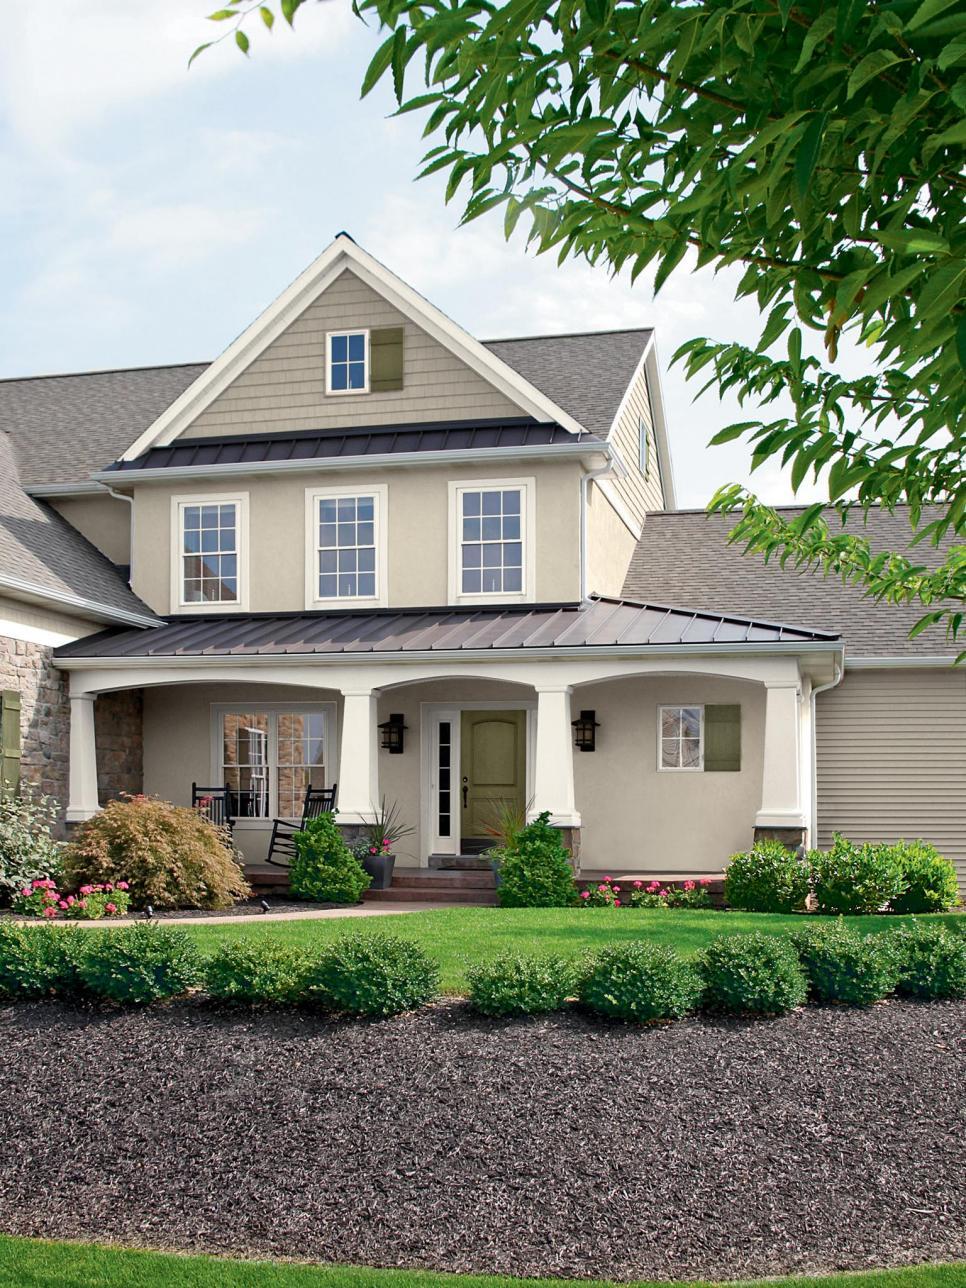 28 Inviting Home Exterior Color Ideas | HGTV